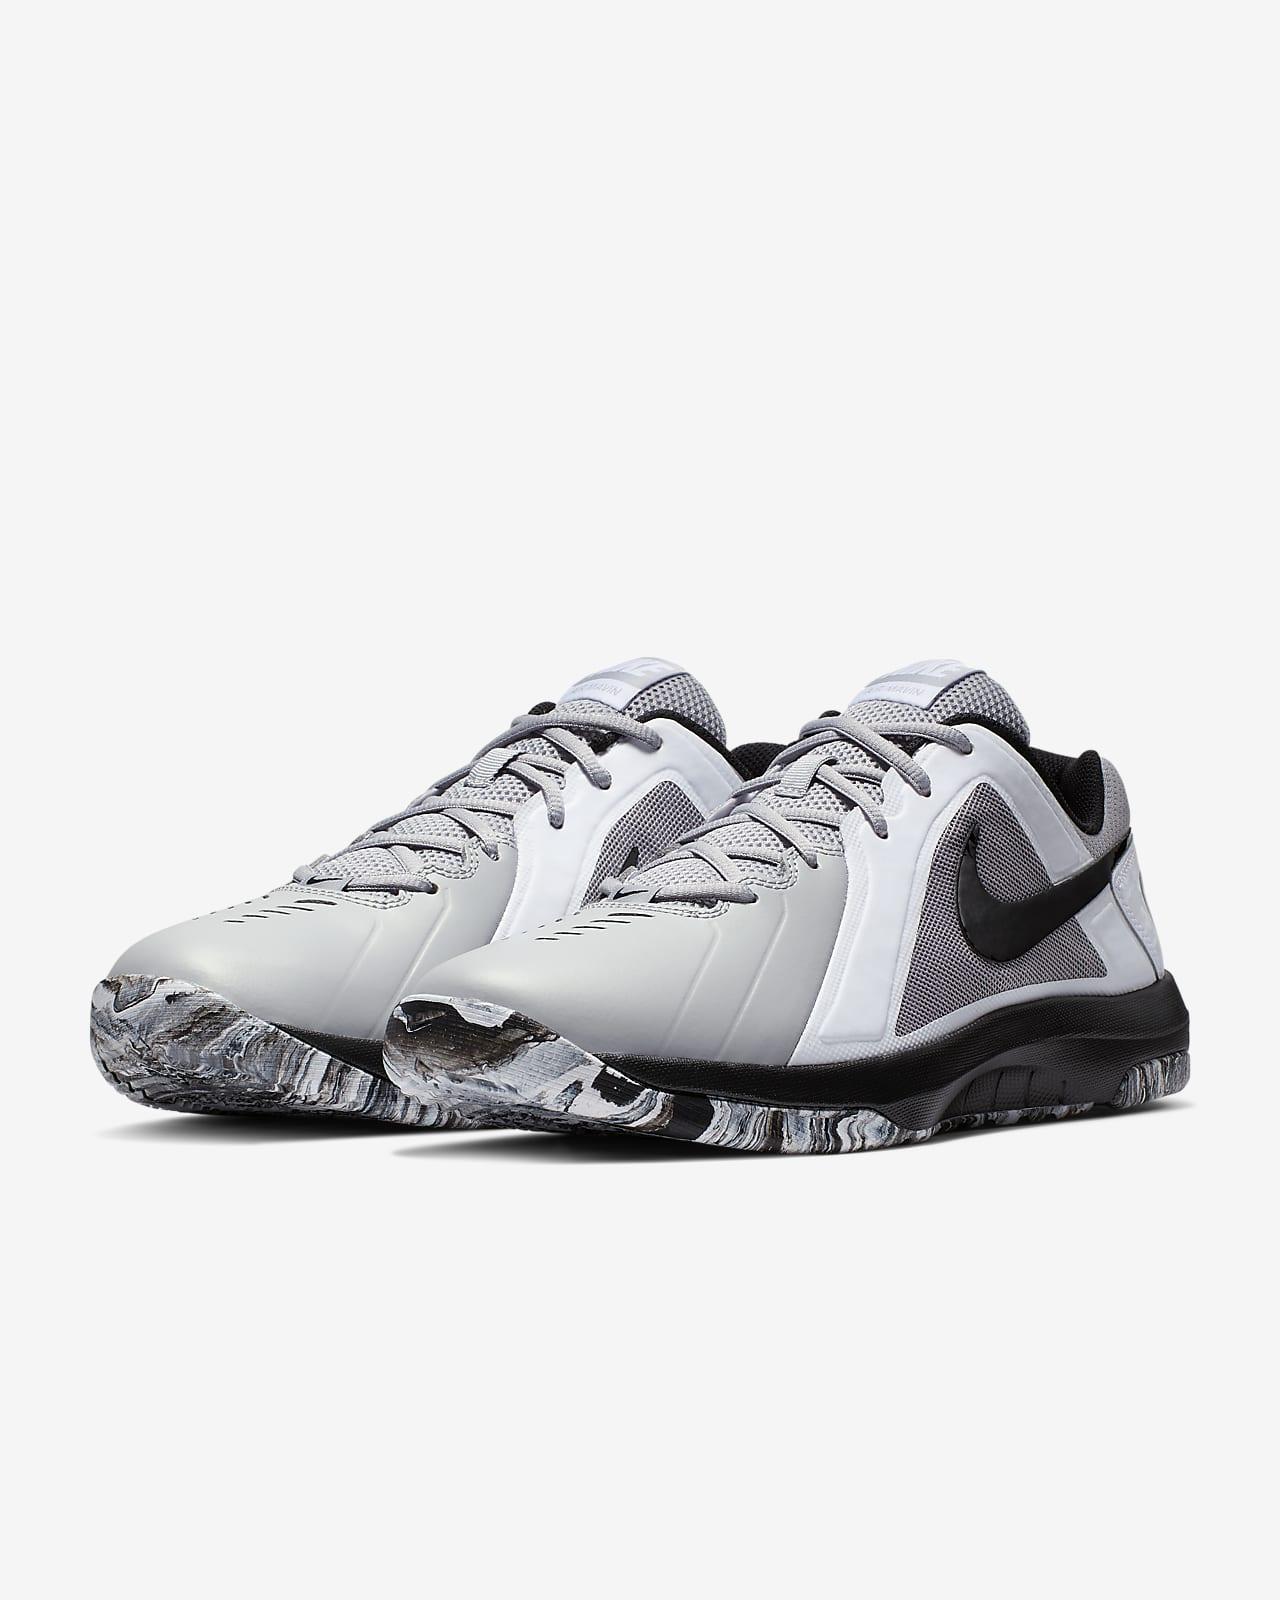 Nike Air Mavin Low Men's Basketball Shoe